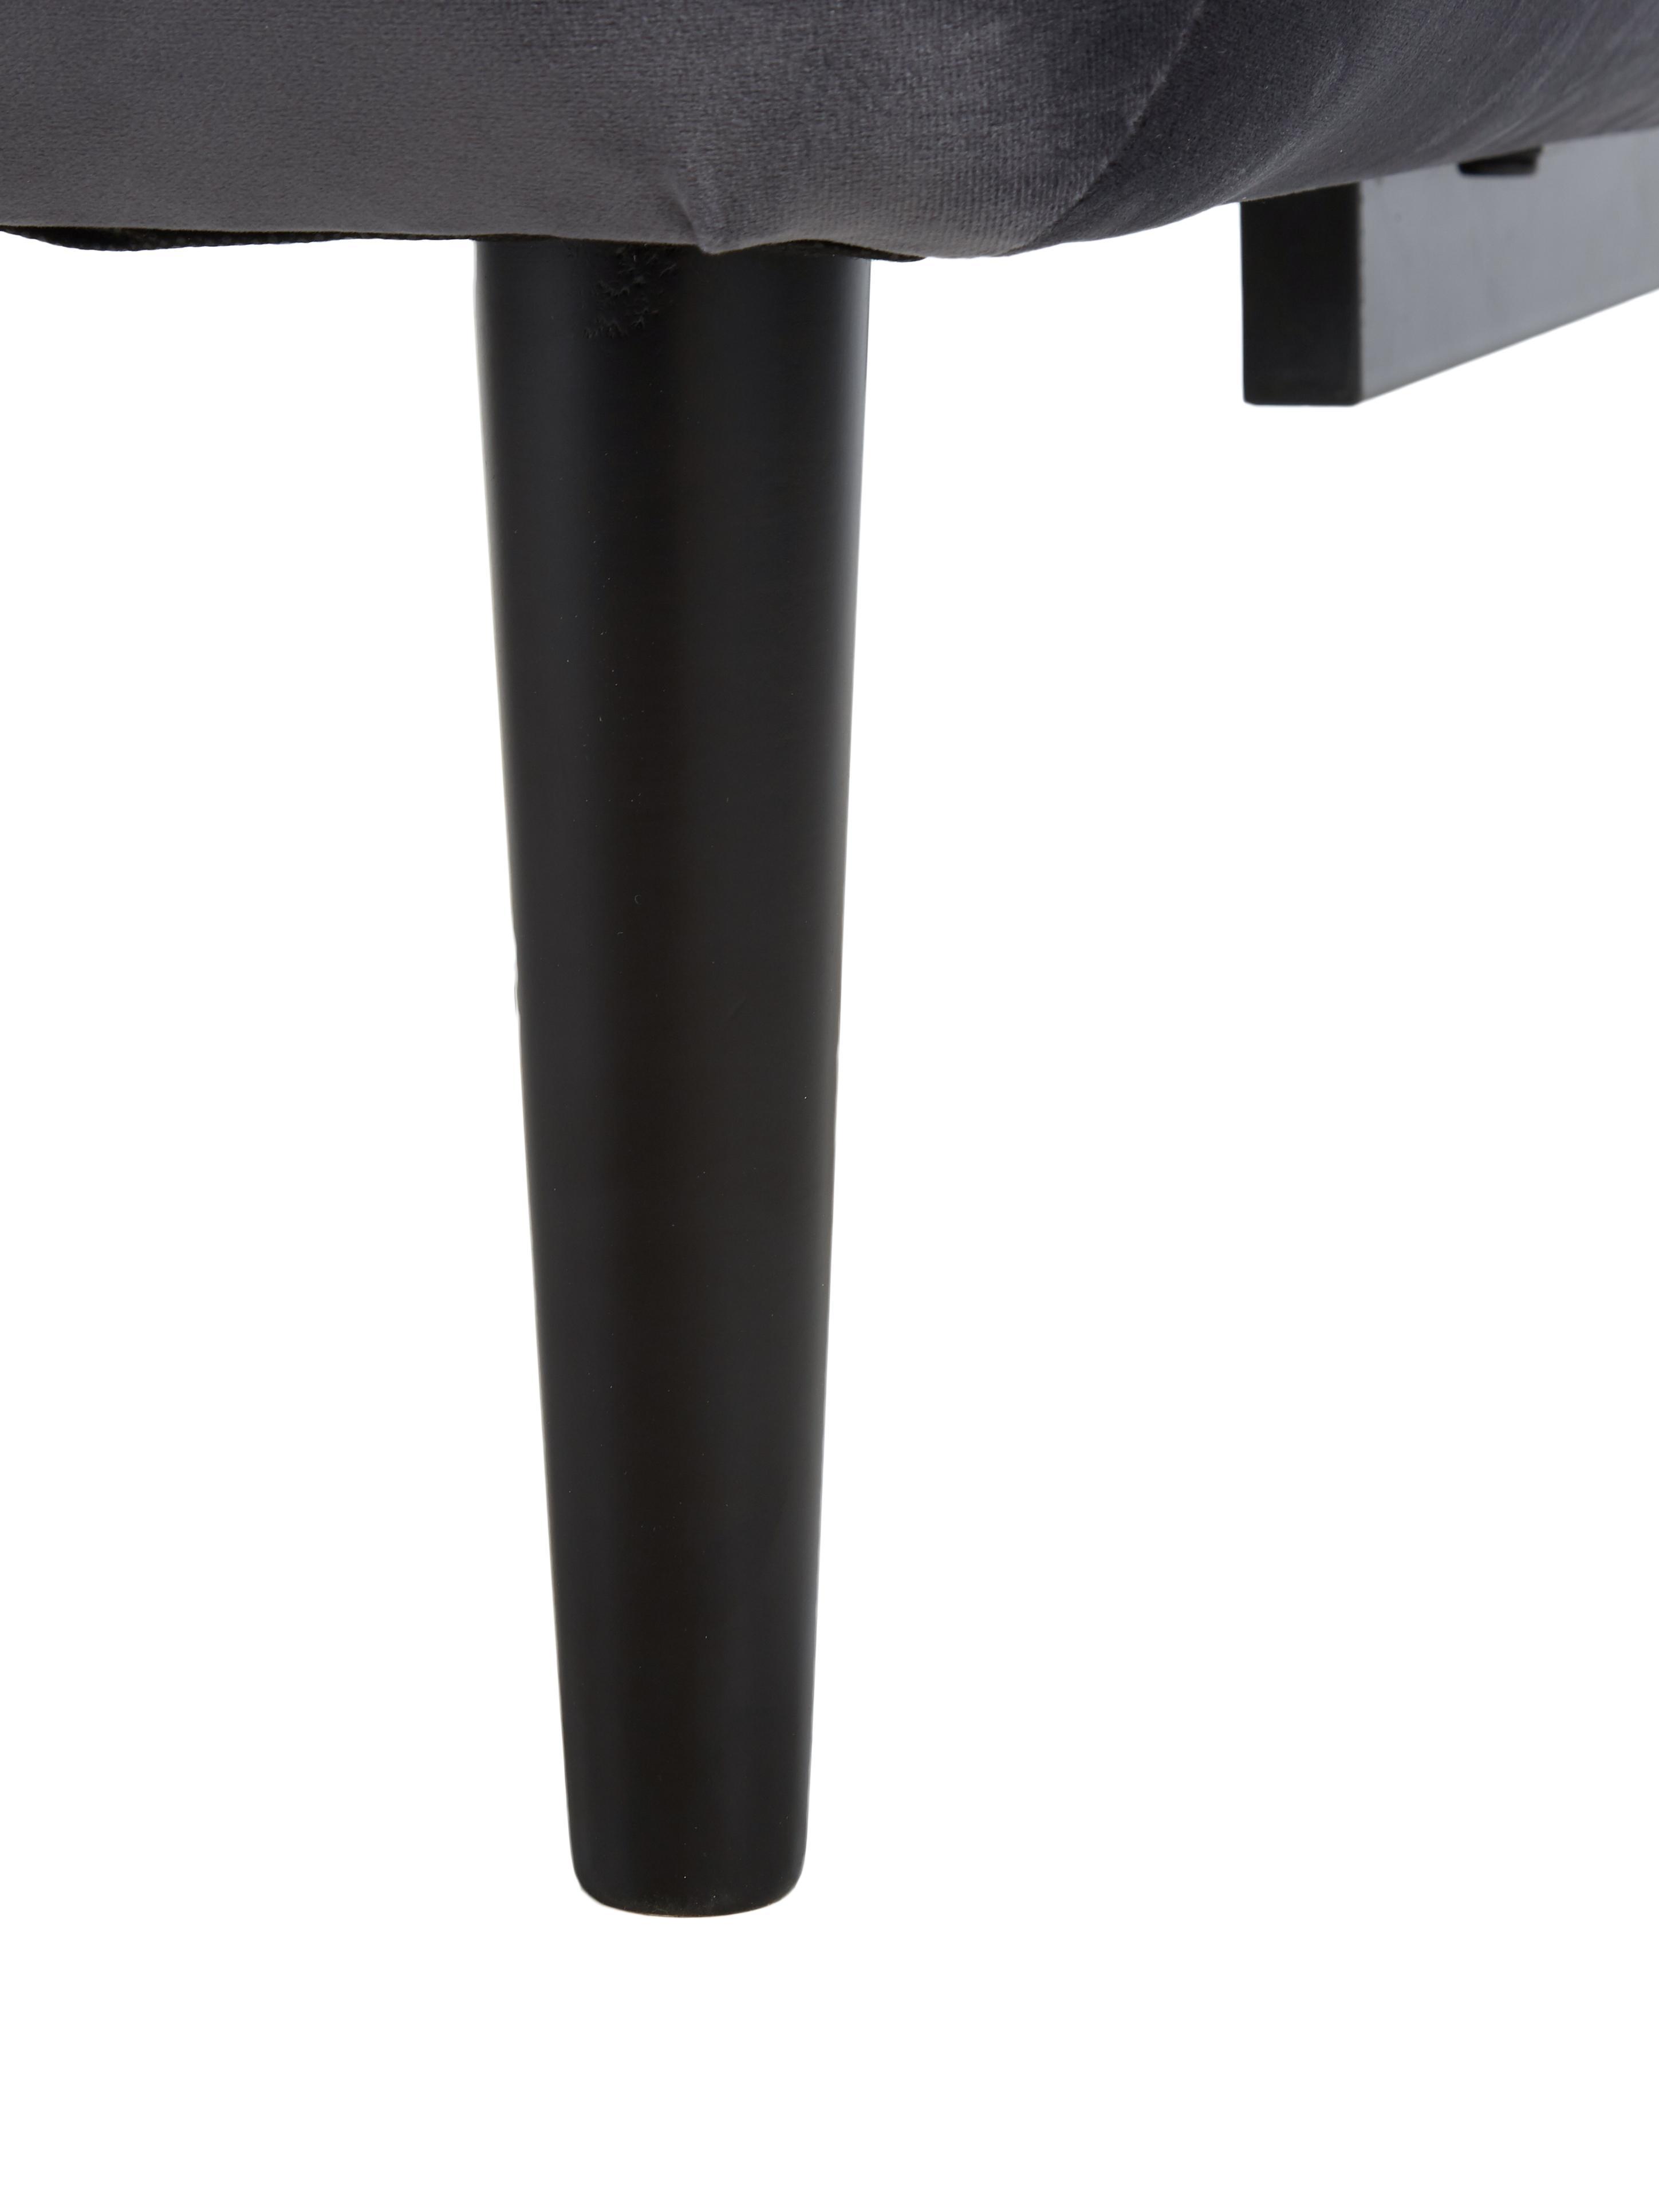 Samt-Schlafsofa Hayley, Bezug: Samt (Polyester) Der hoch, Gestell: Kiefernholz, Samt Grau, B 200 x T 89 cm